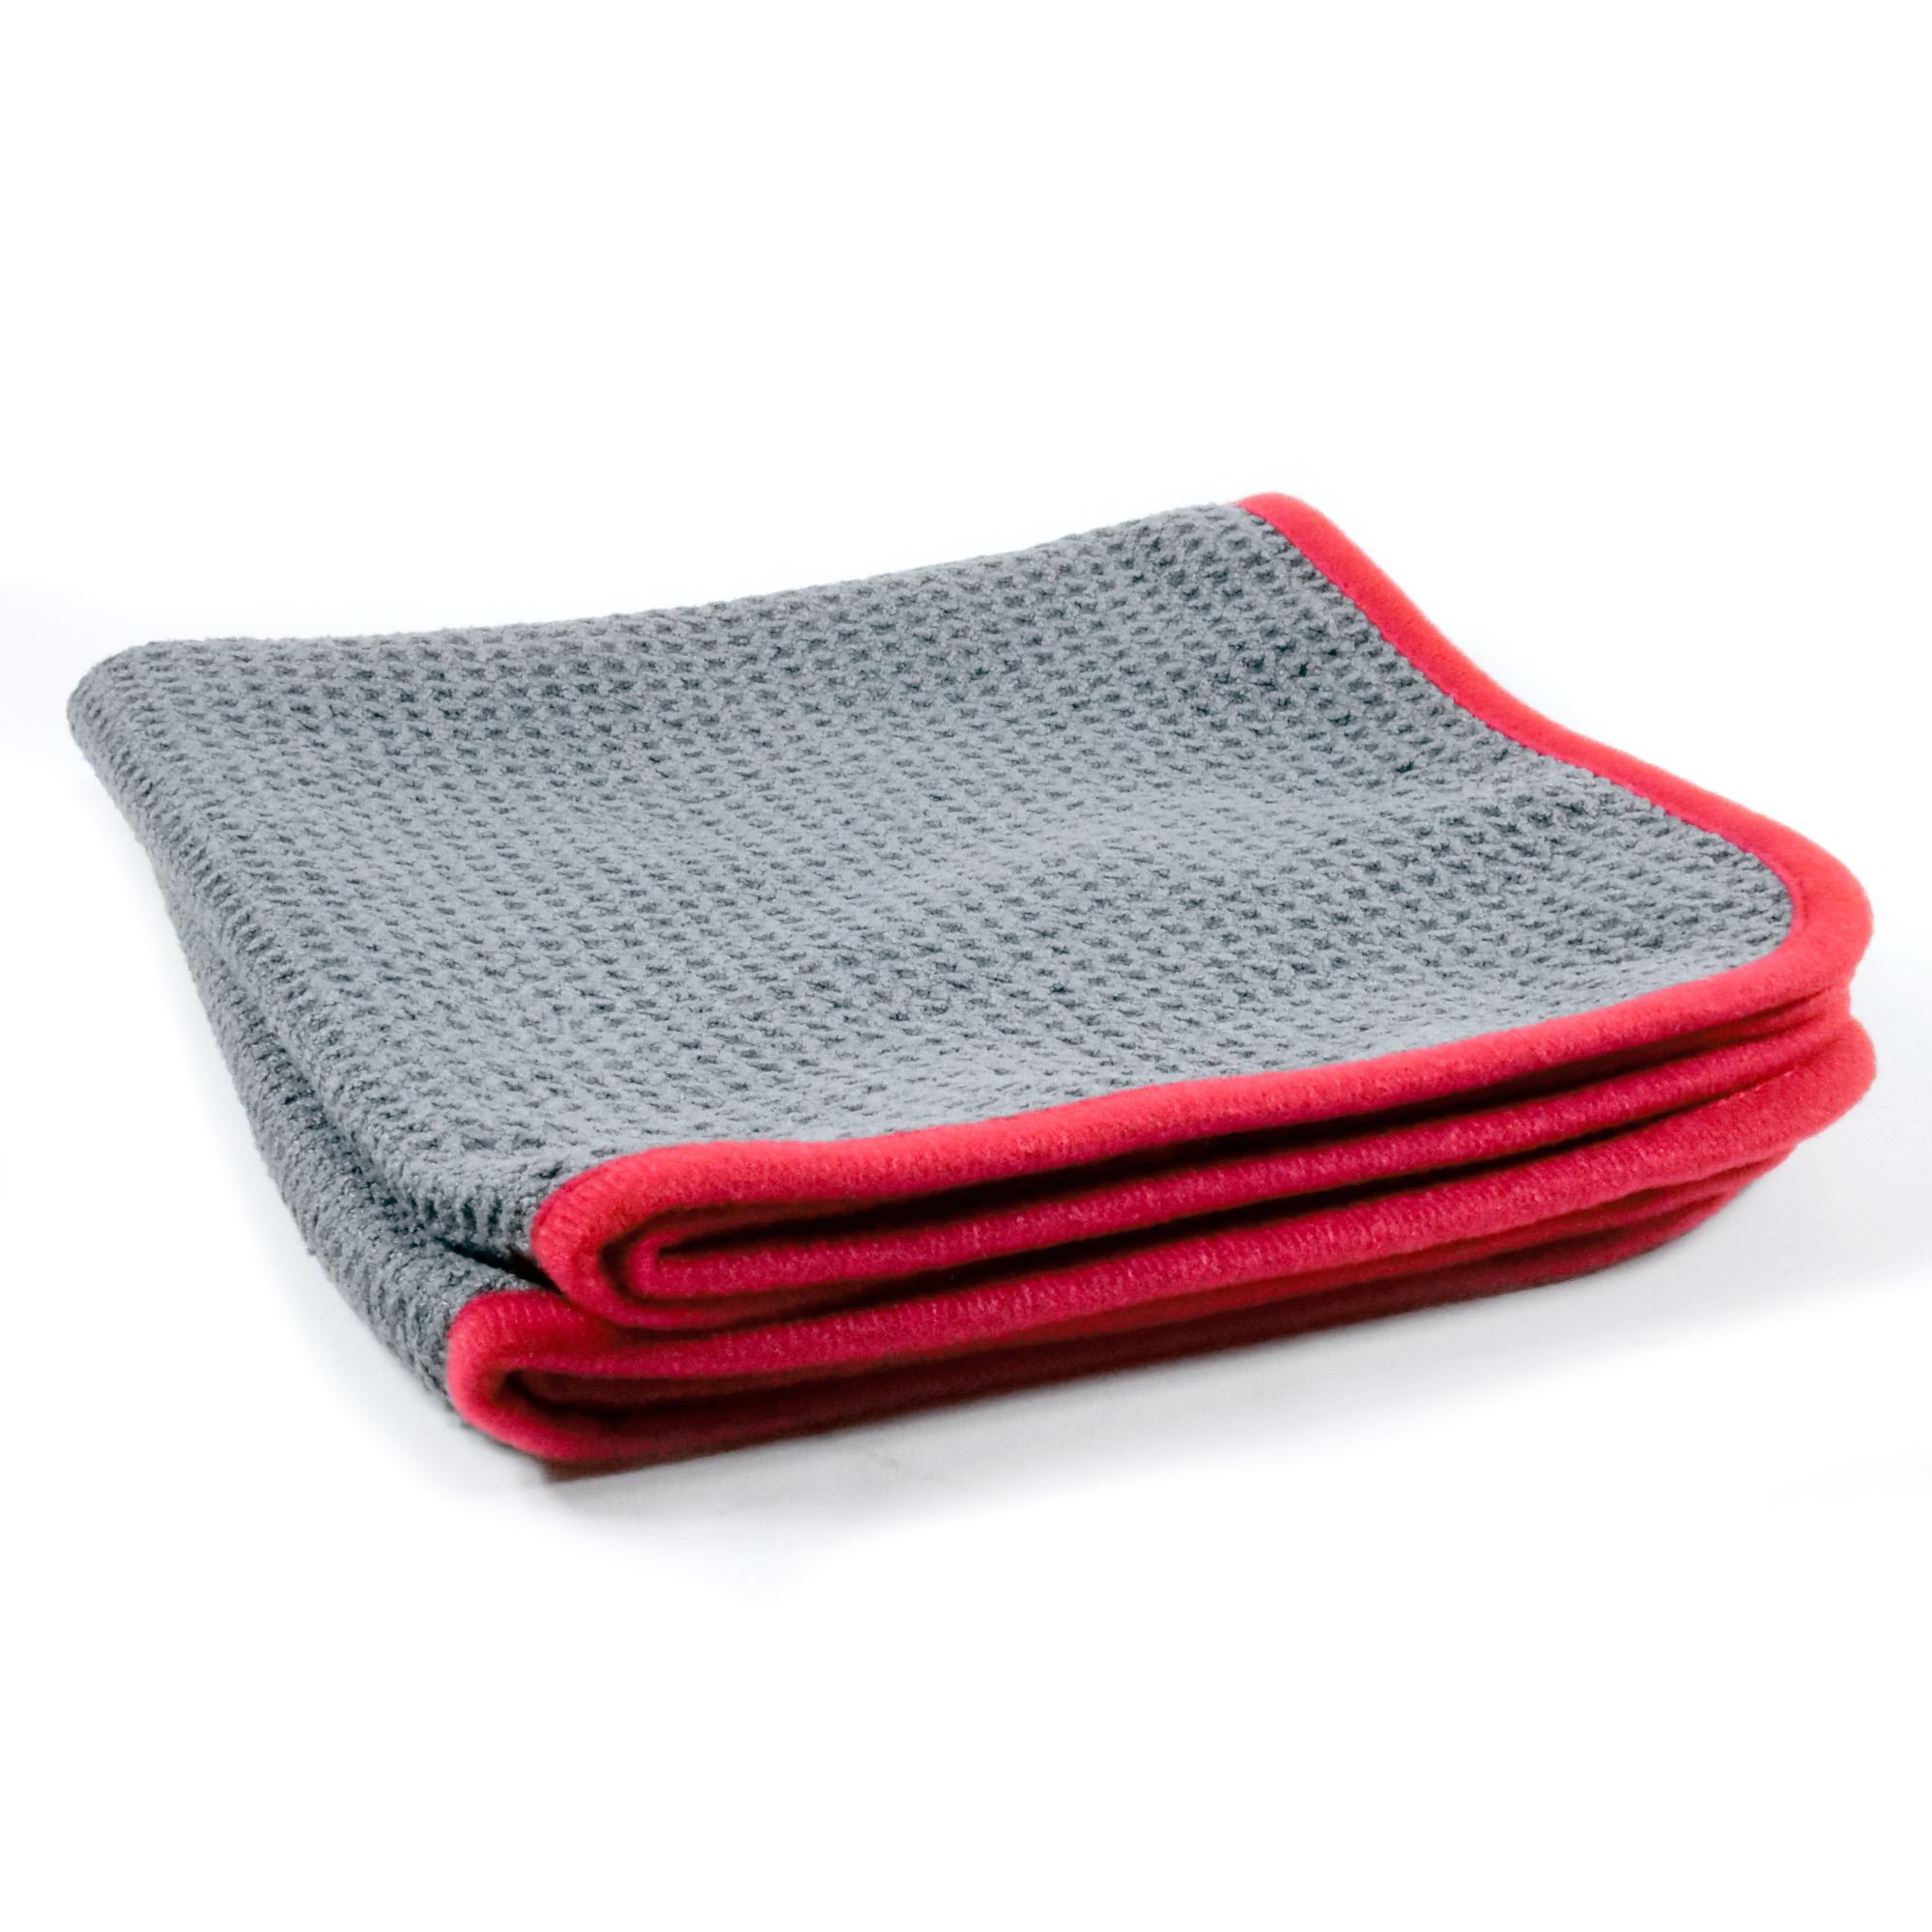 Glass Cleaning Towels (für trockene Anwendung) - 2 er Pack